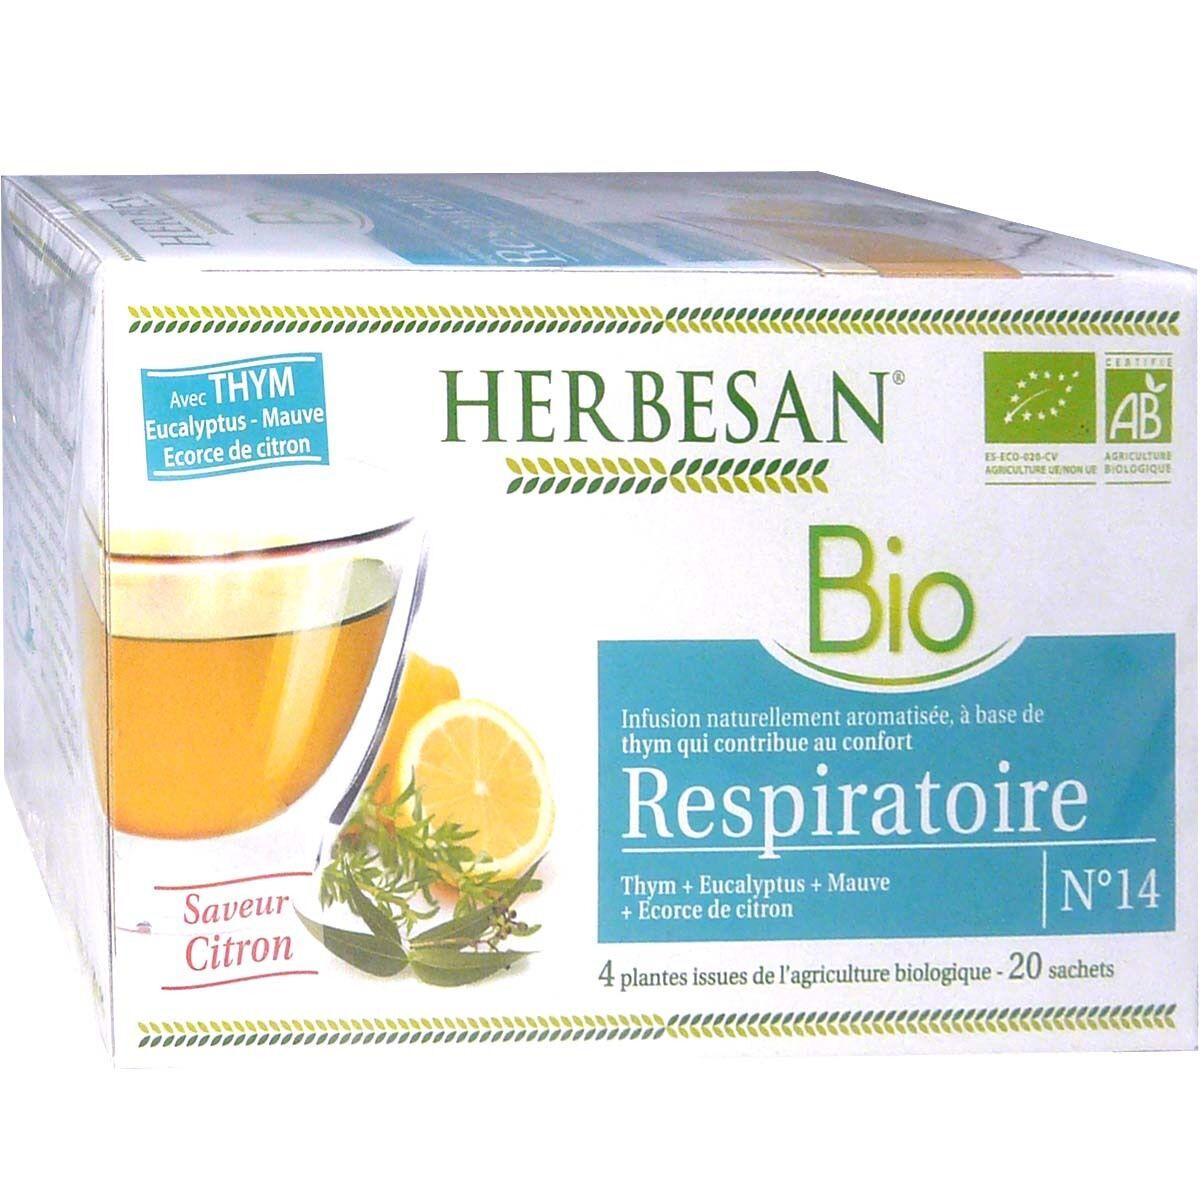 Herbesan infusion bio respiratoire gout citron x20 sachets